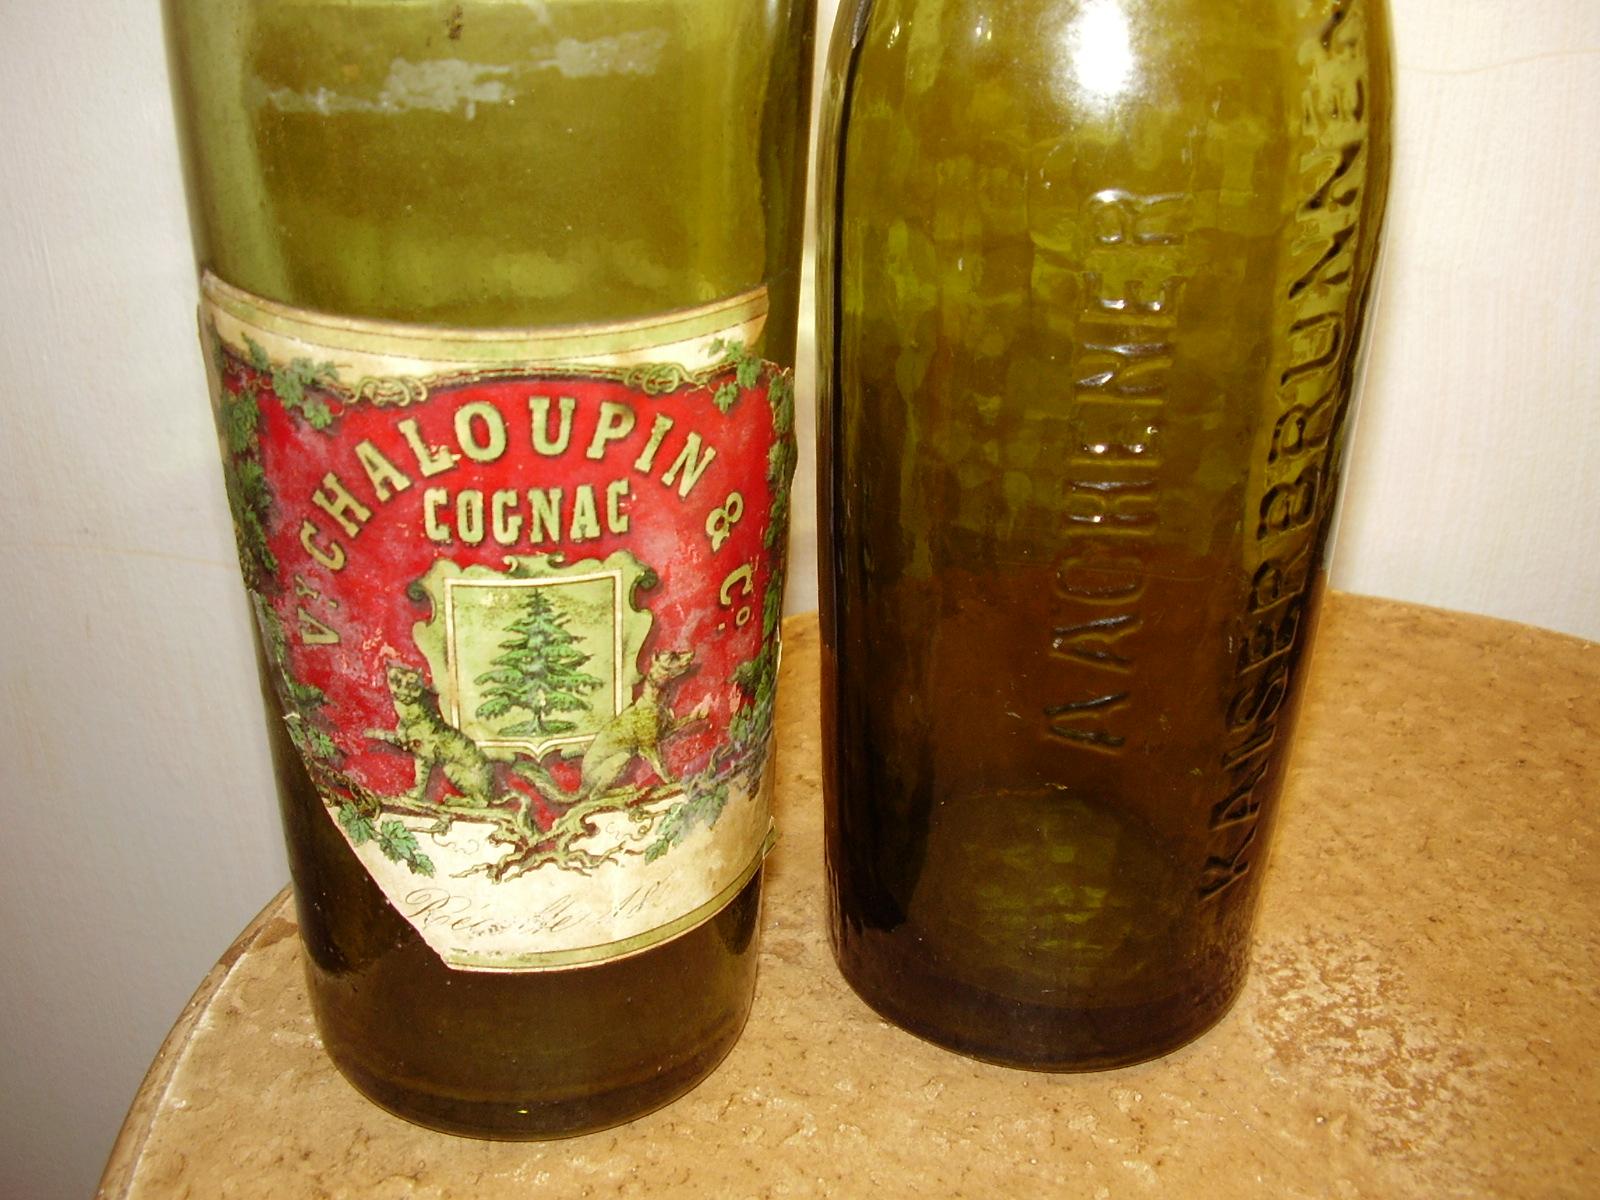 1800 Chaloupin Co Cognac bottle